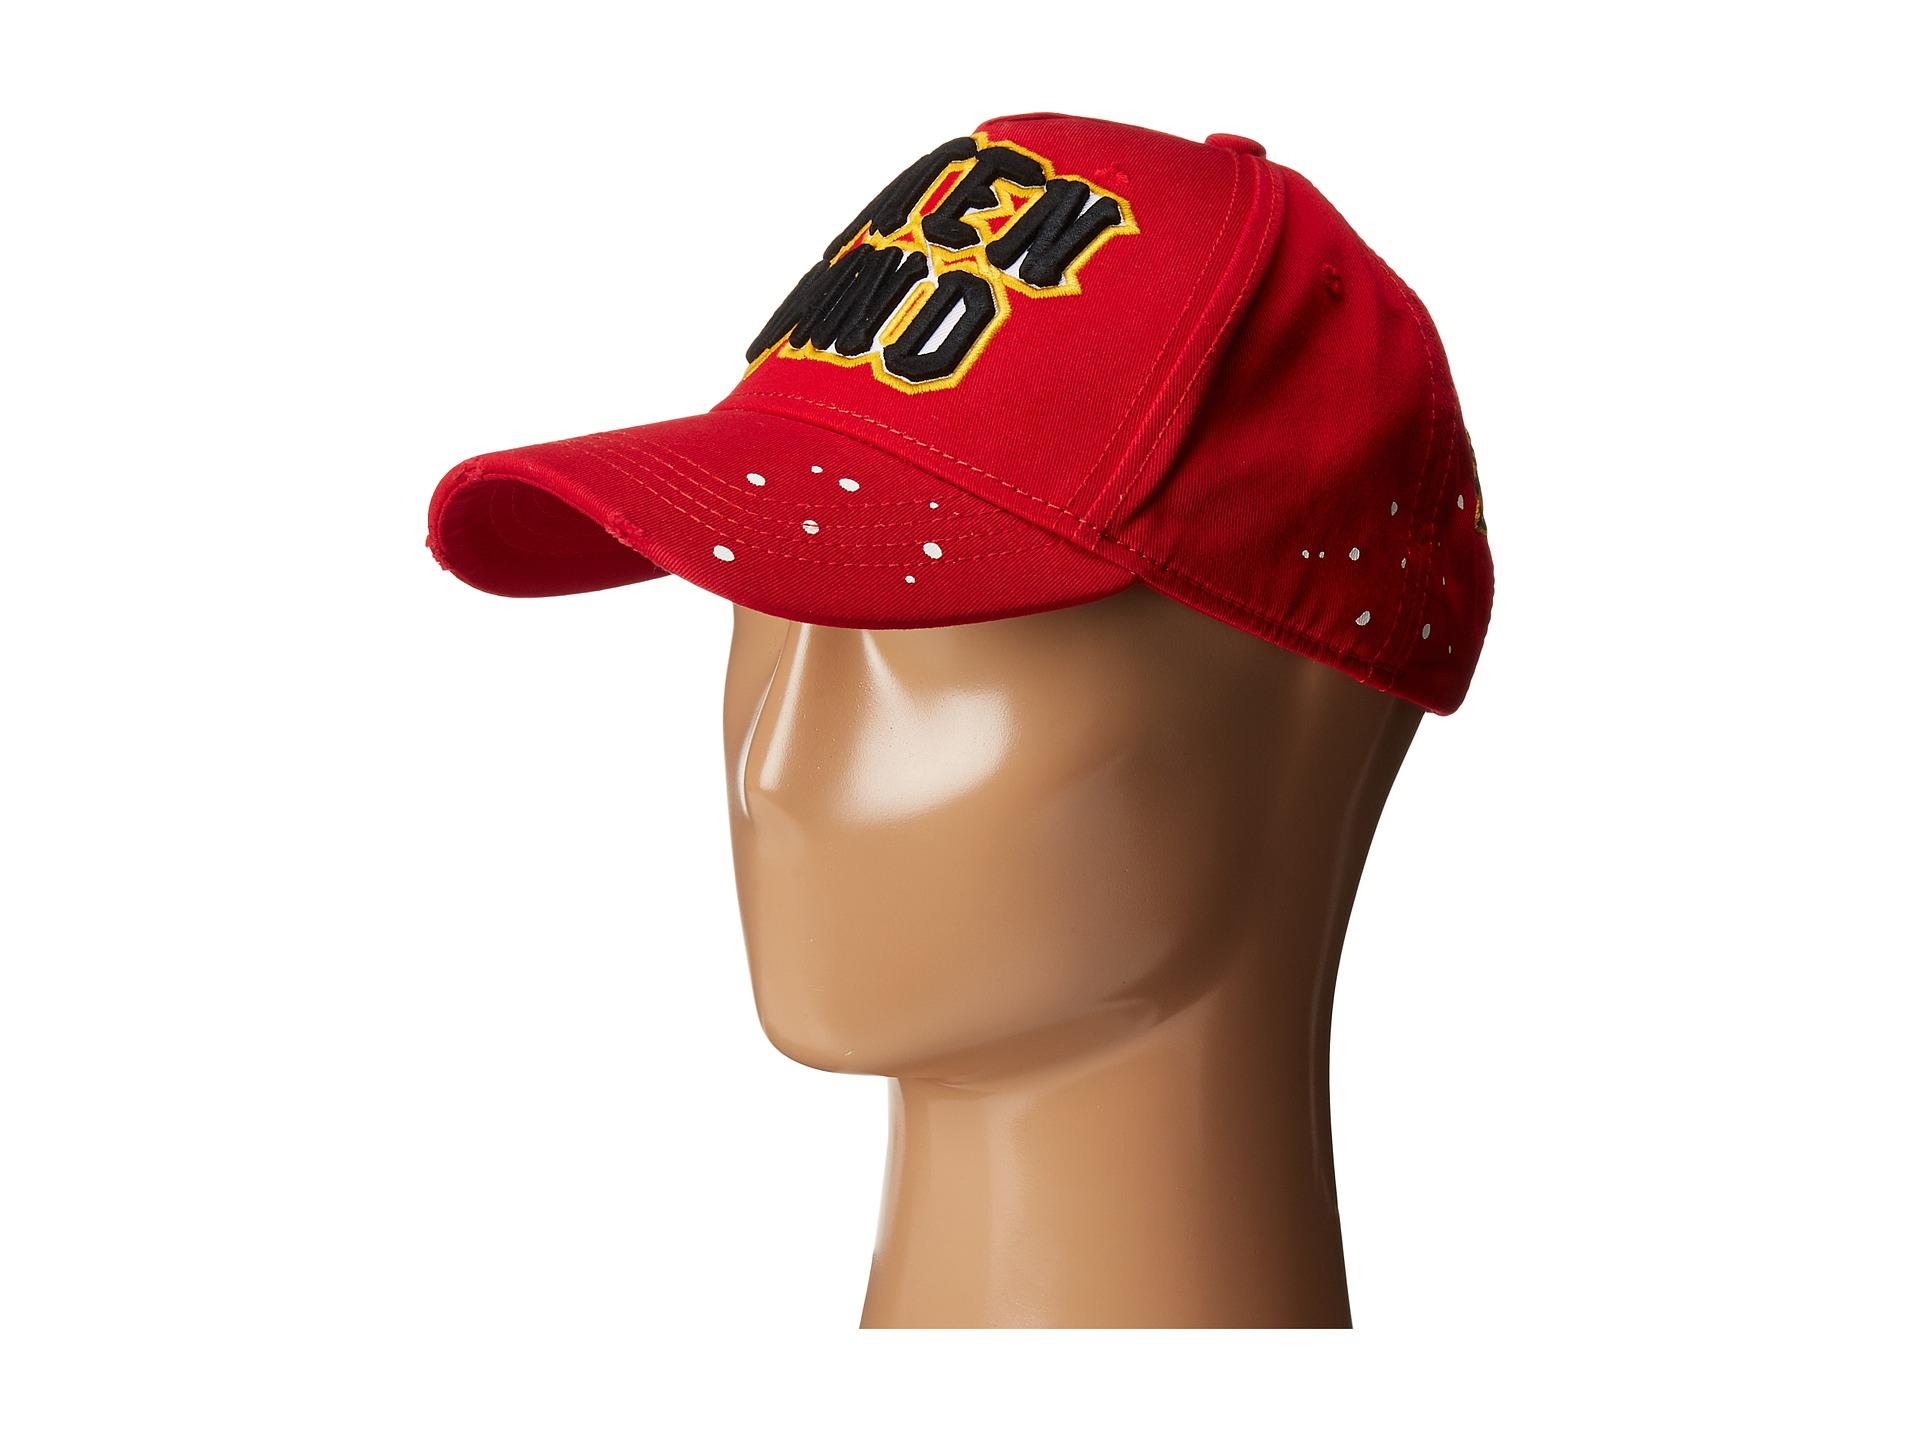 8b6c68556745c1 ... cheapest lyst dsquared caten band baseball cap in red for men b126f  e3fec